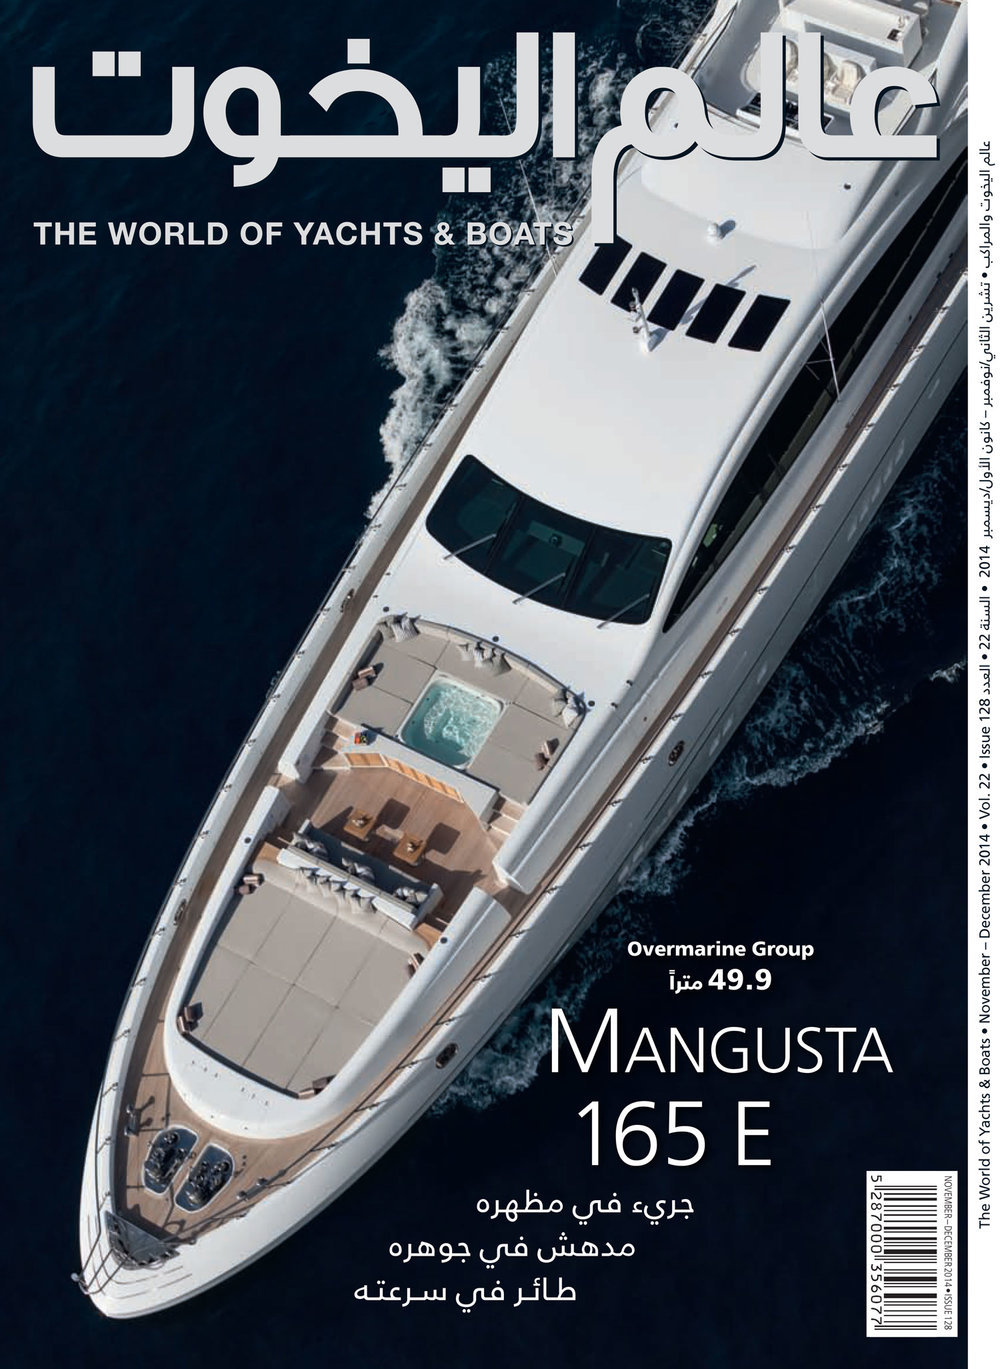 UAE_Yacht_Magazine.jpg